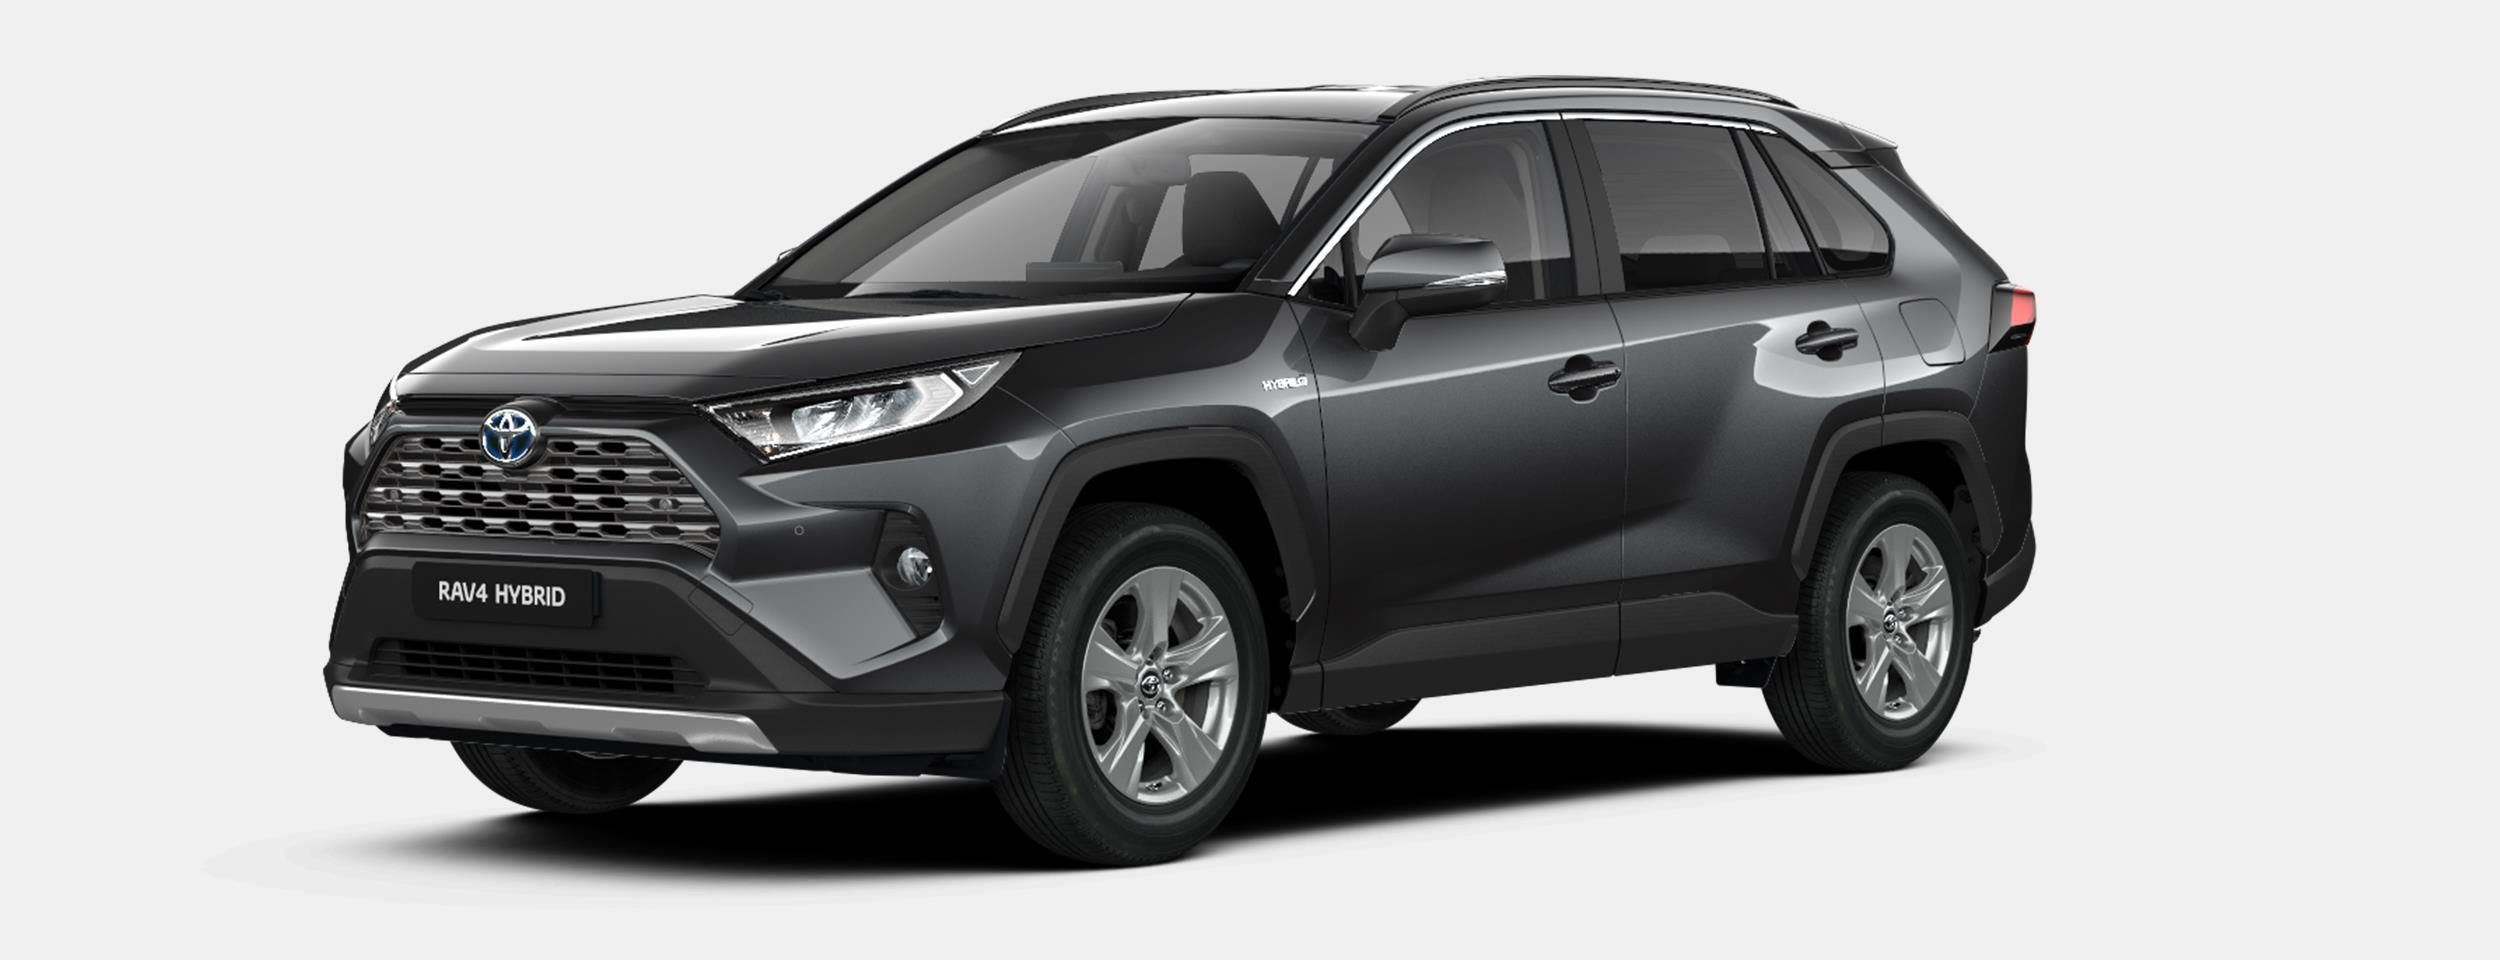 Nieuw Toyota Rav4 5 d. 2.5 Hybrid 2WD e-CVT Premium Plus L 1G3 - DARK GREY METALLIC 2